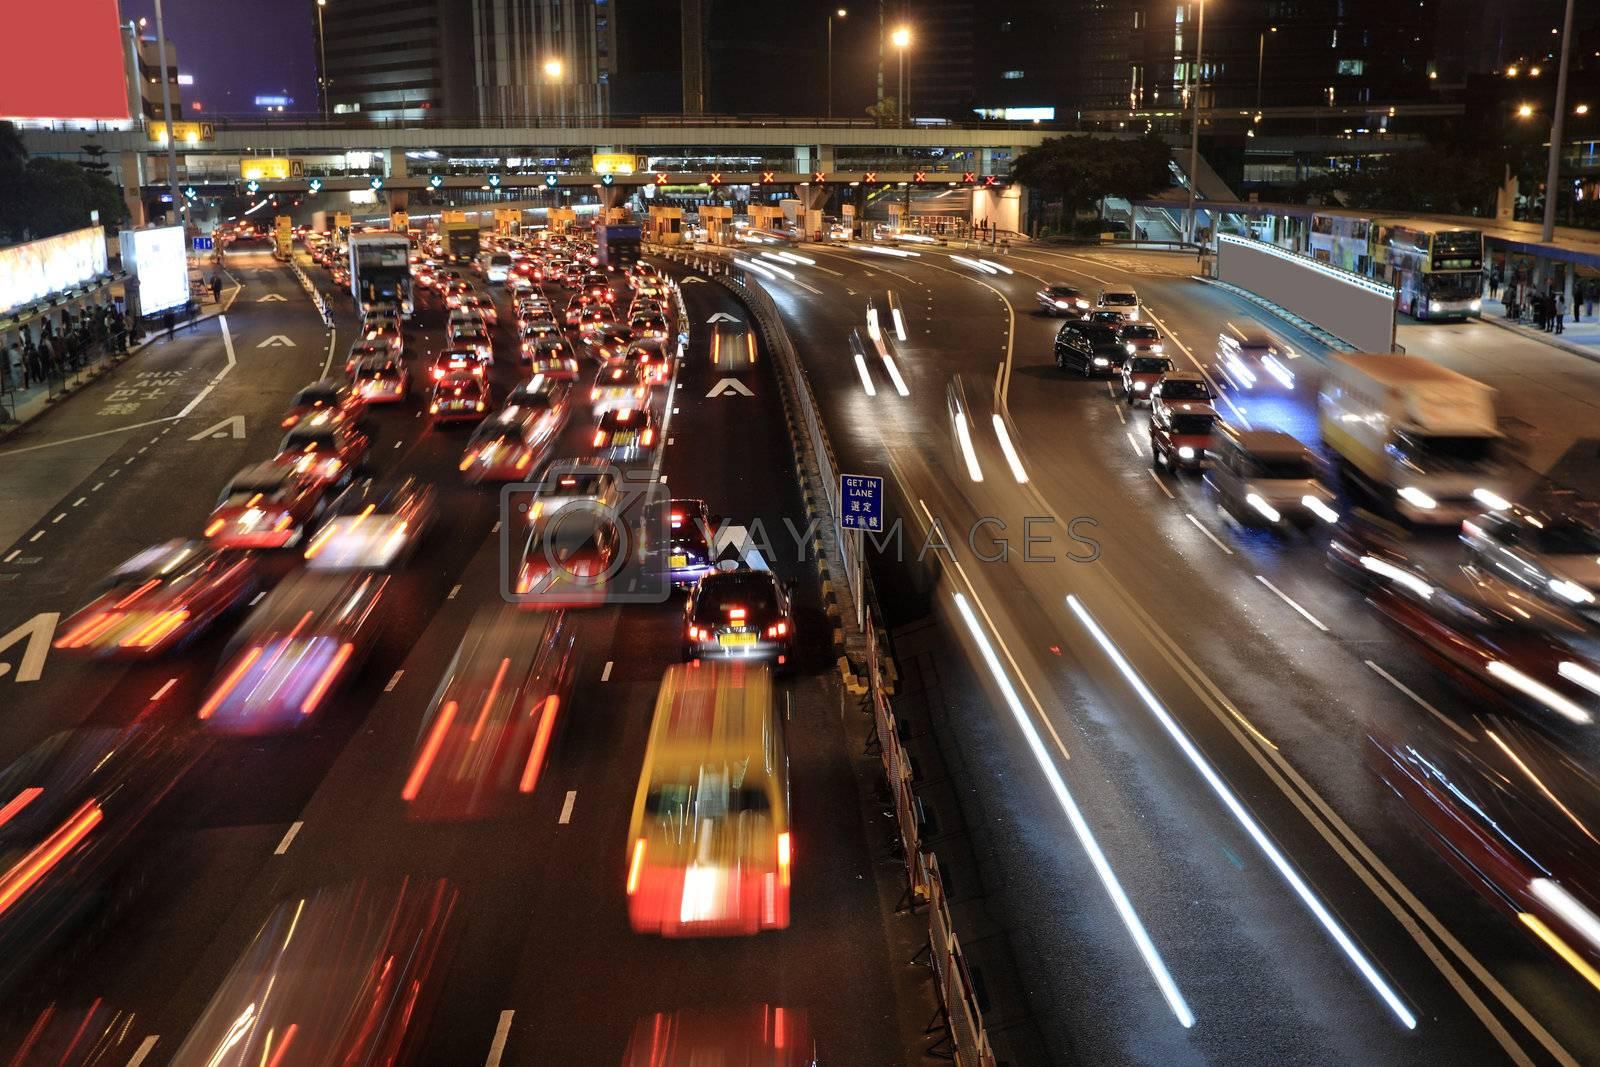 Traffic jam in Hong Kong at night  by leungchopan